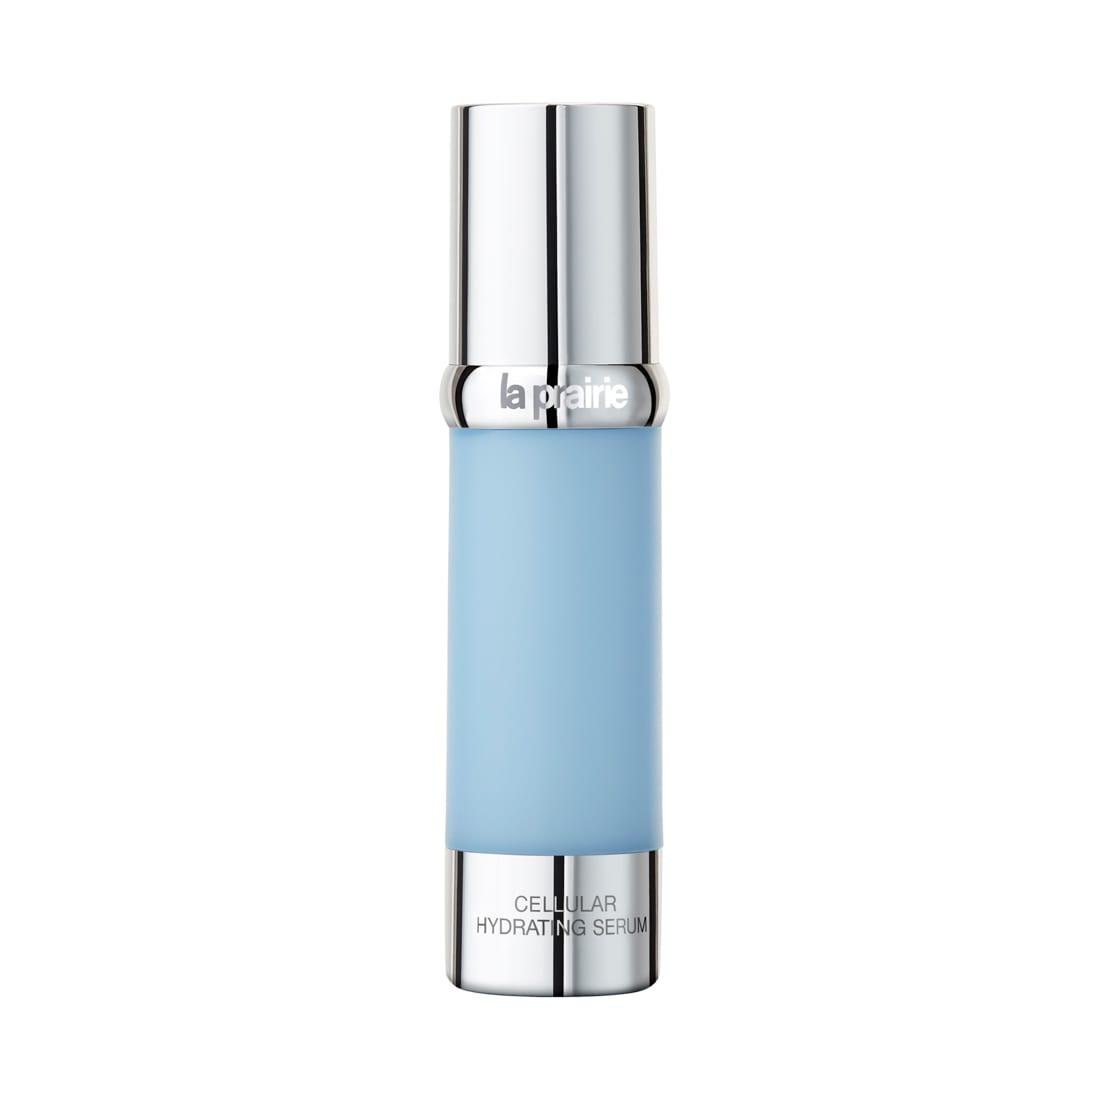 Cellular Hydrating Serum 30ml